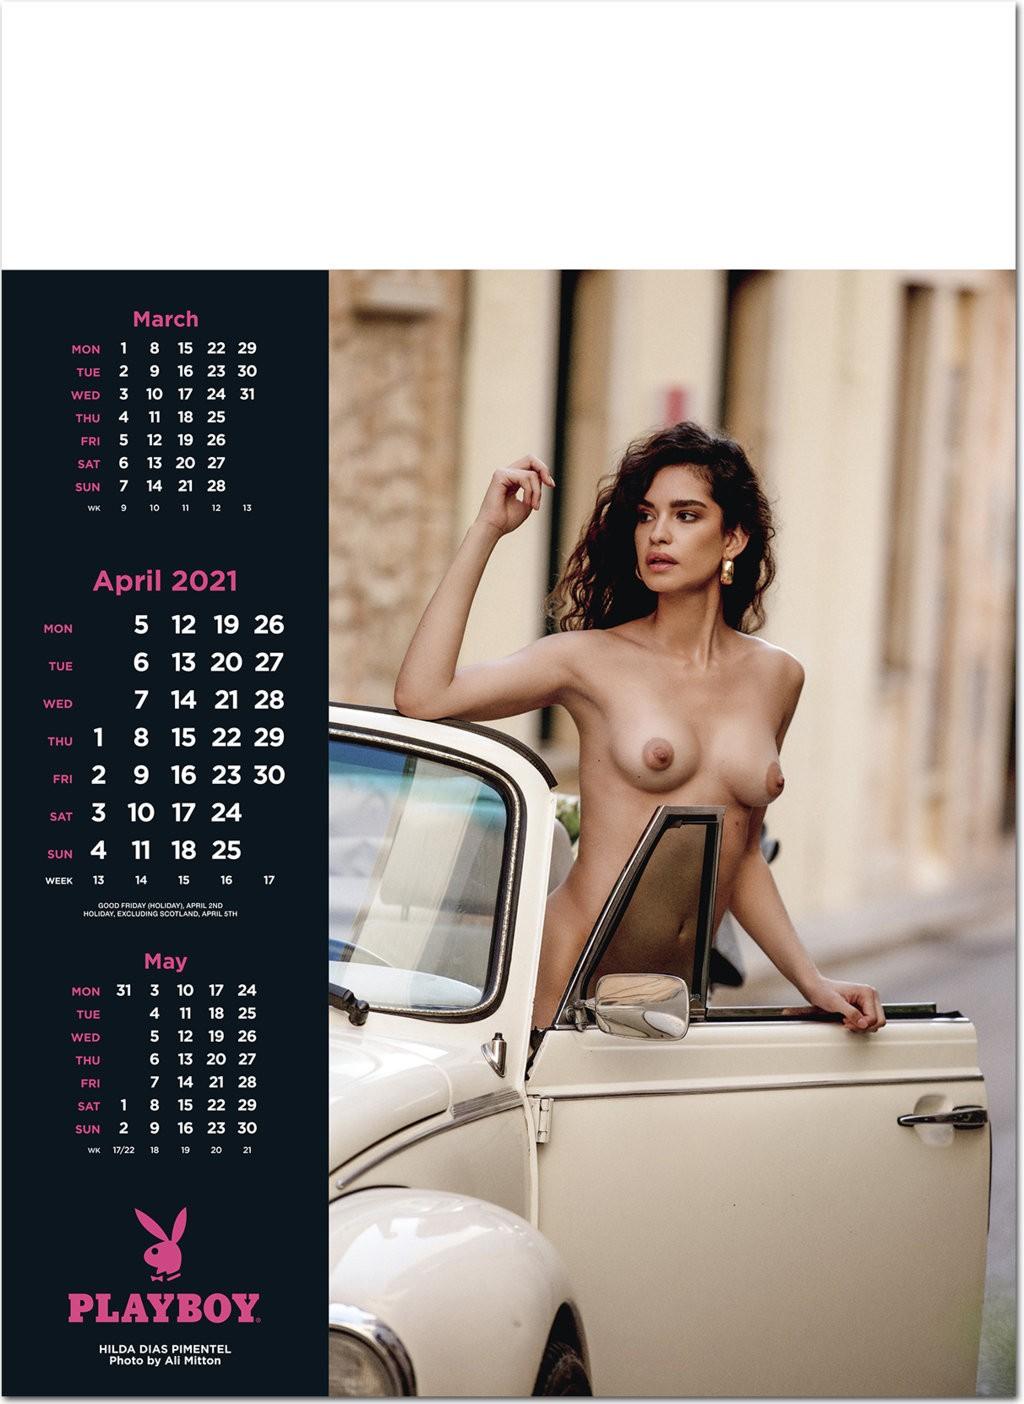 Playboy April 2021